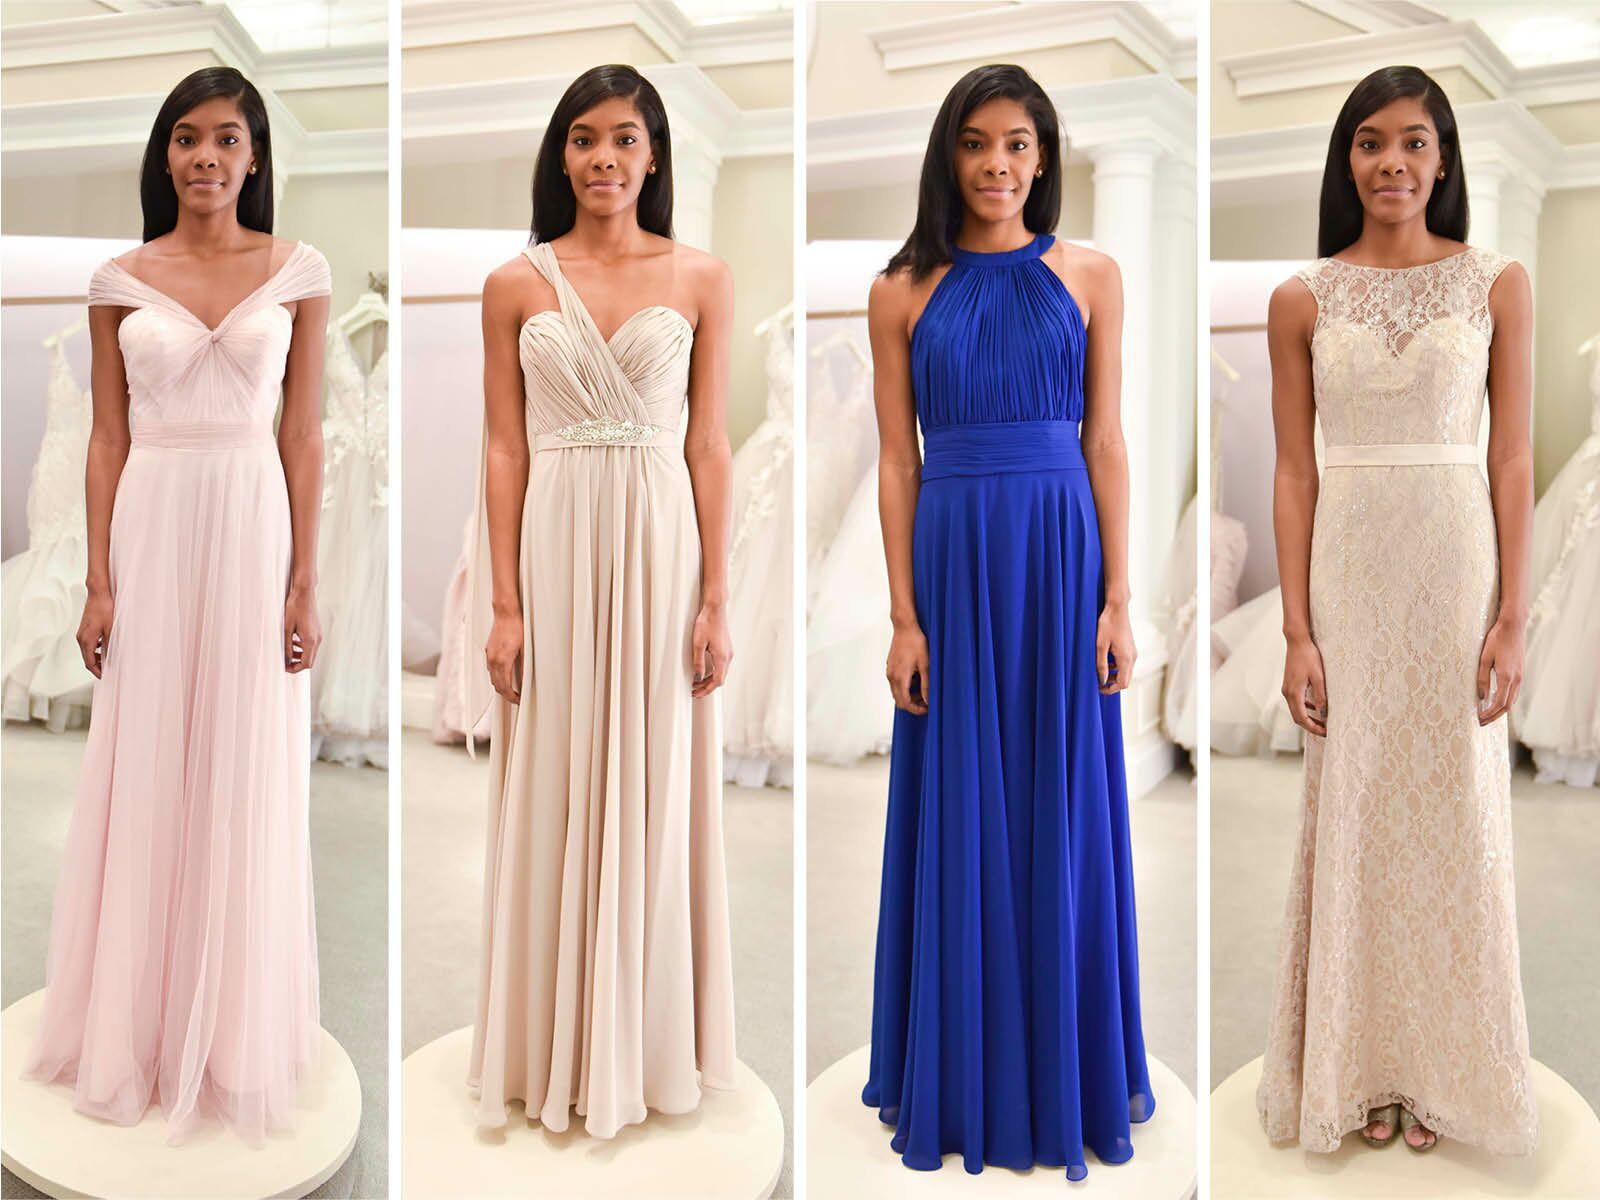 Wedding Wedding Bridesmaid Dresses cheap bridesmaid dresses 55 under 100